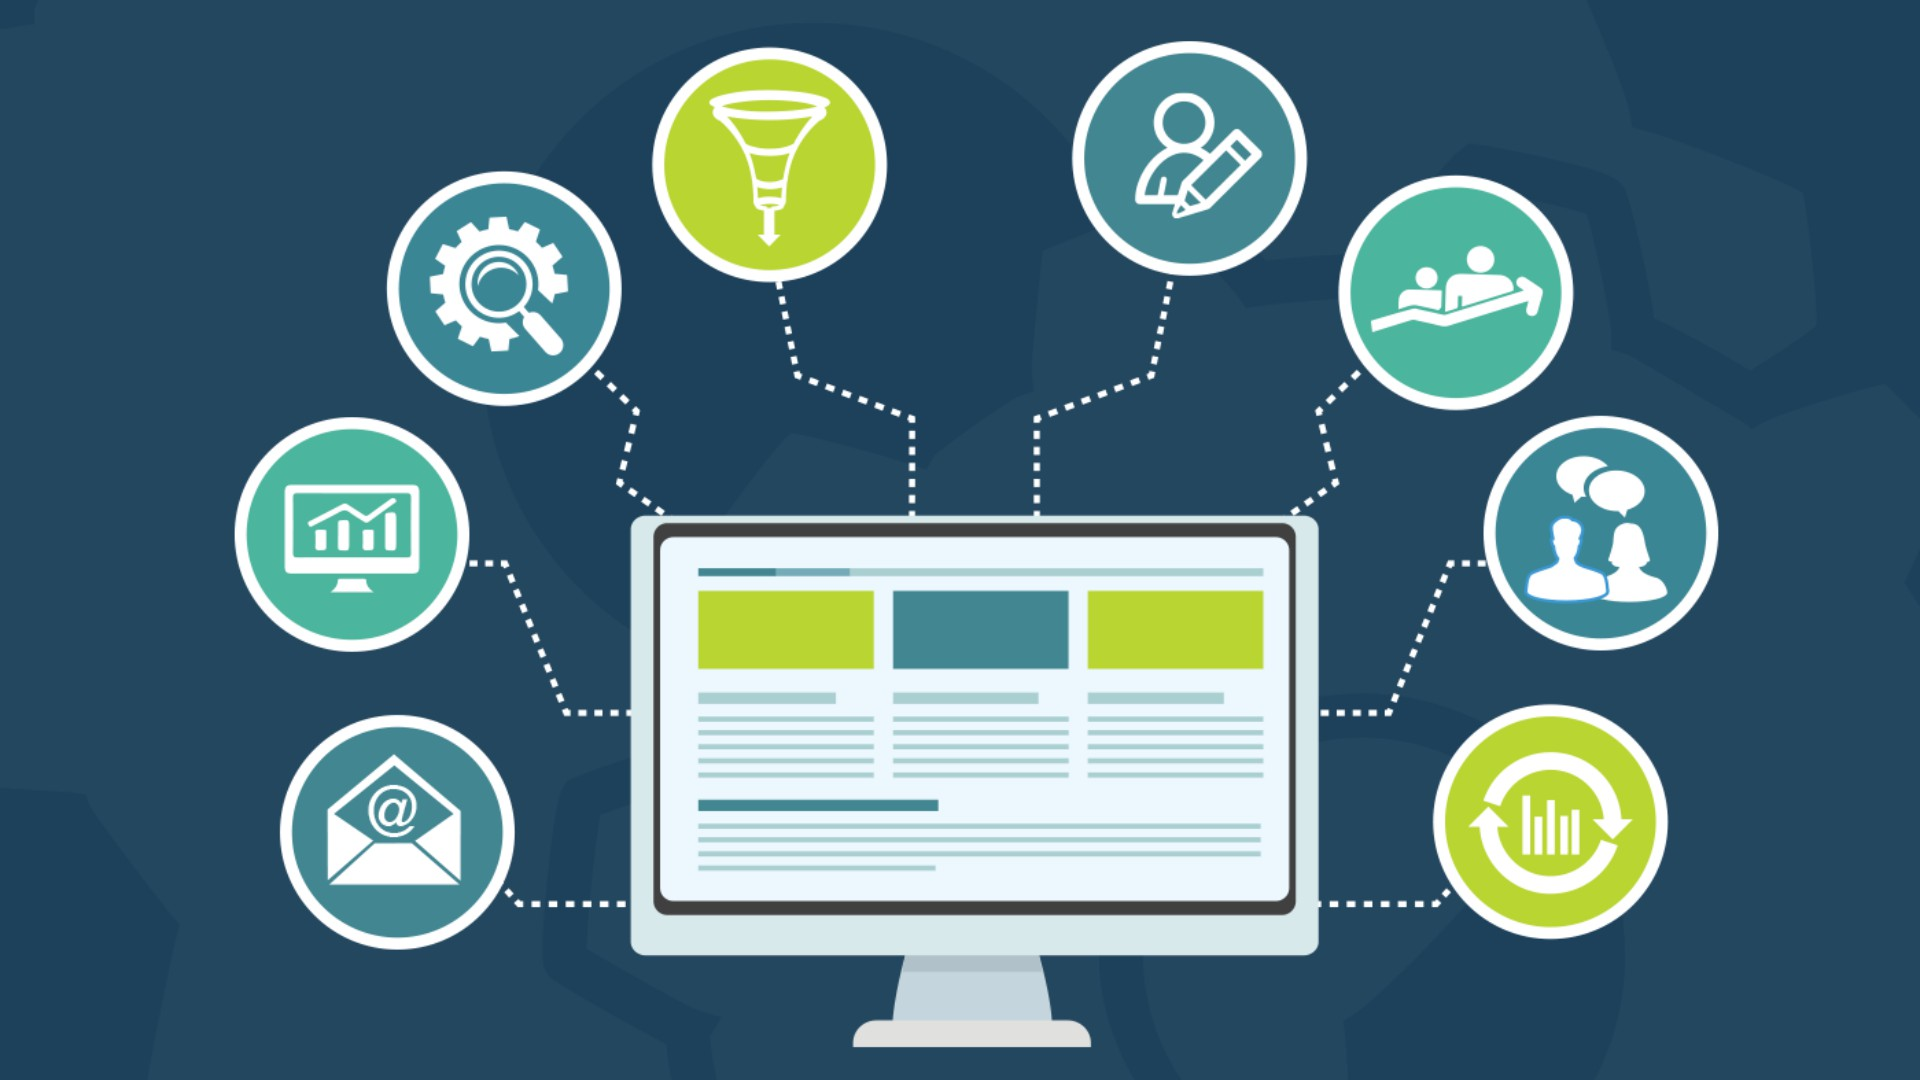 desarrollo-web-malaga